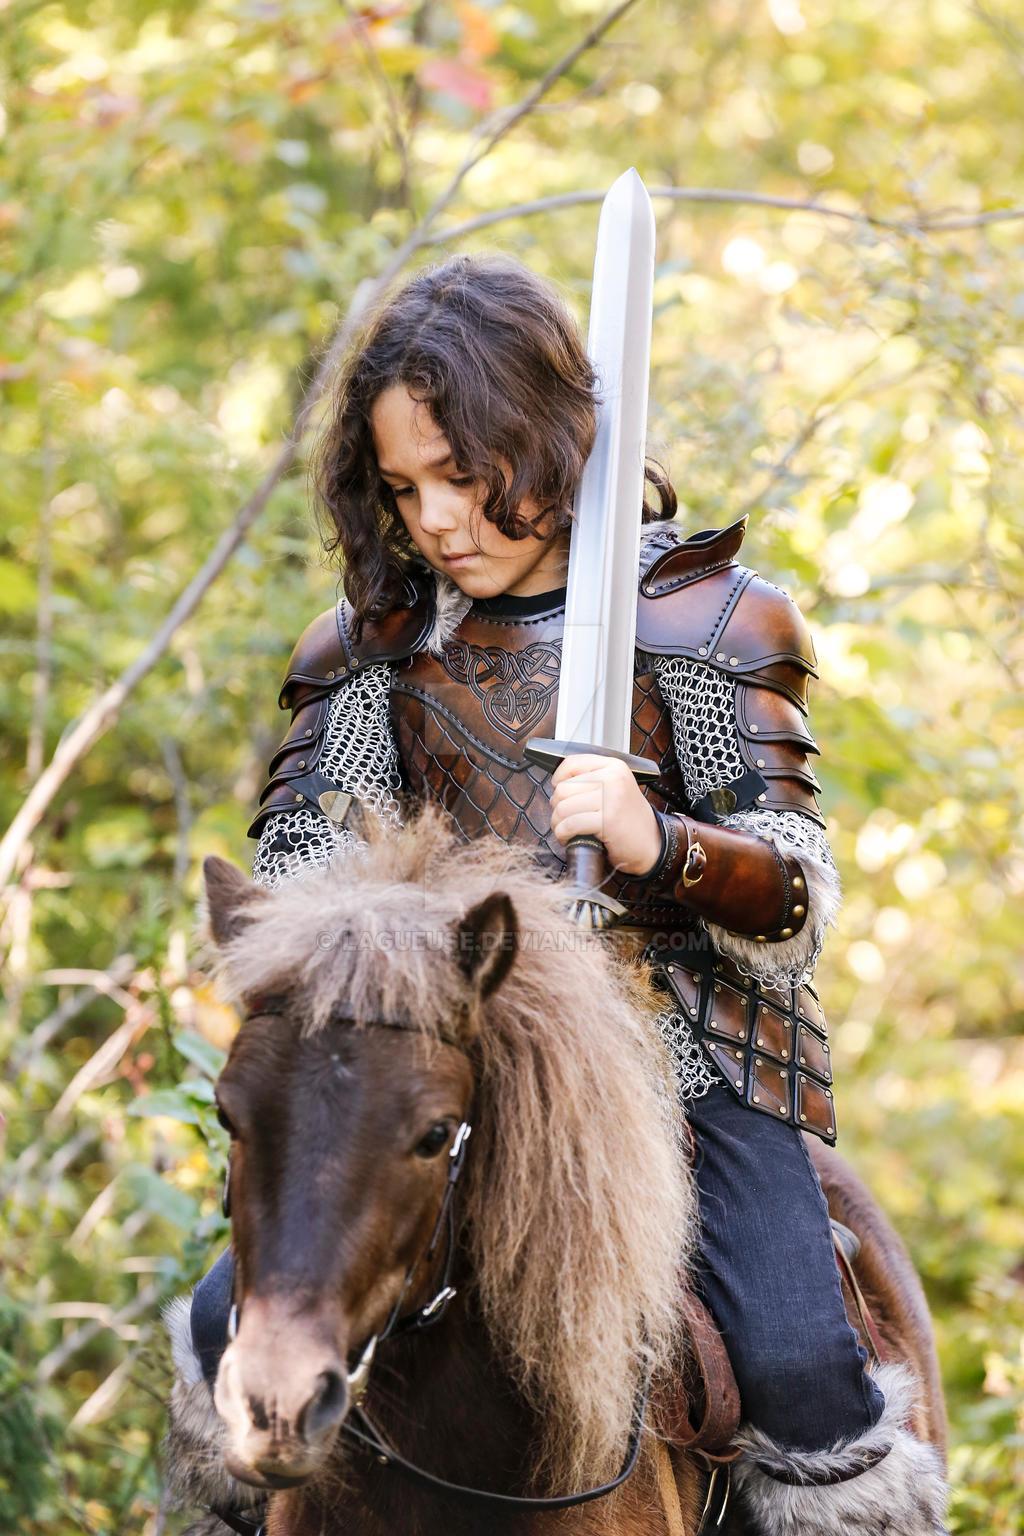 Kid Leather Armor Viking Celtic By Lagueuse On Deviantart